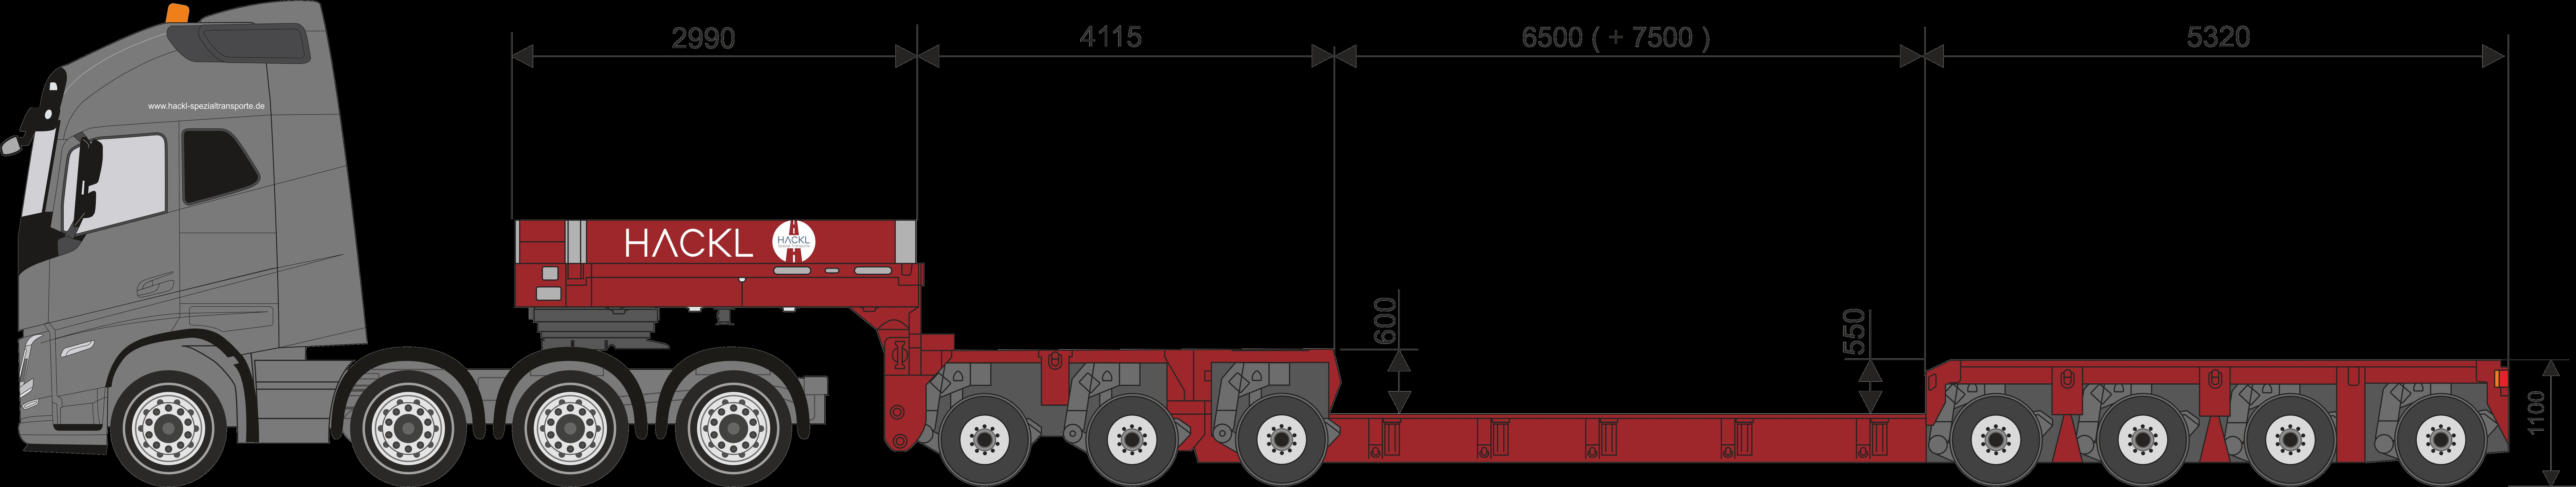 Hackl-Spezialtransporte100